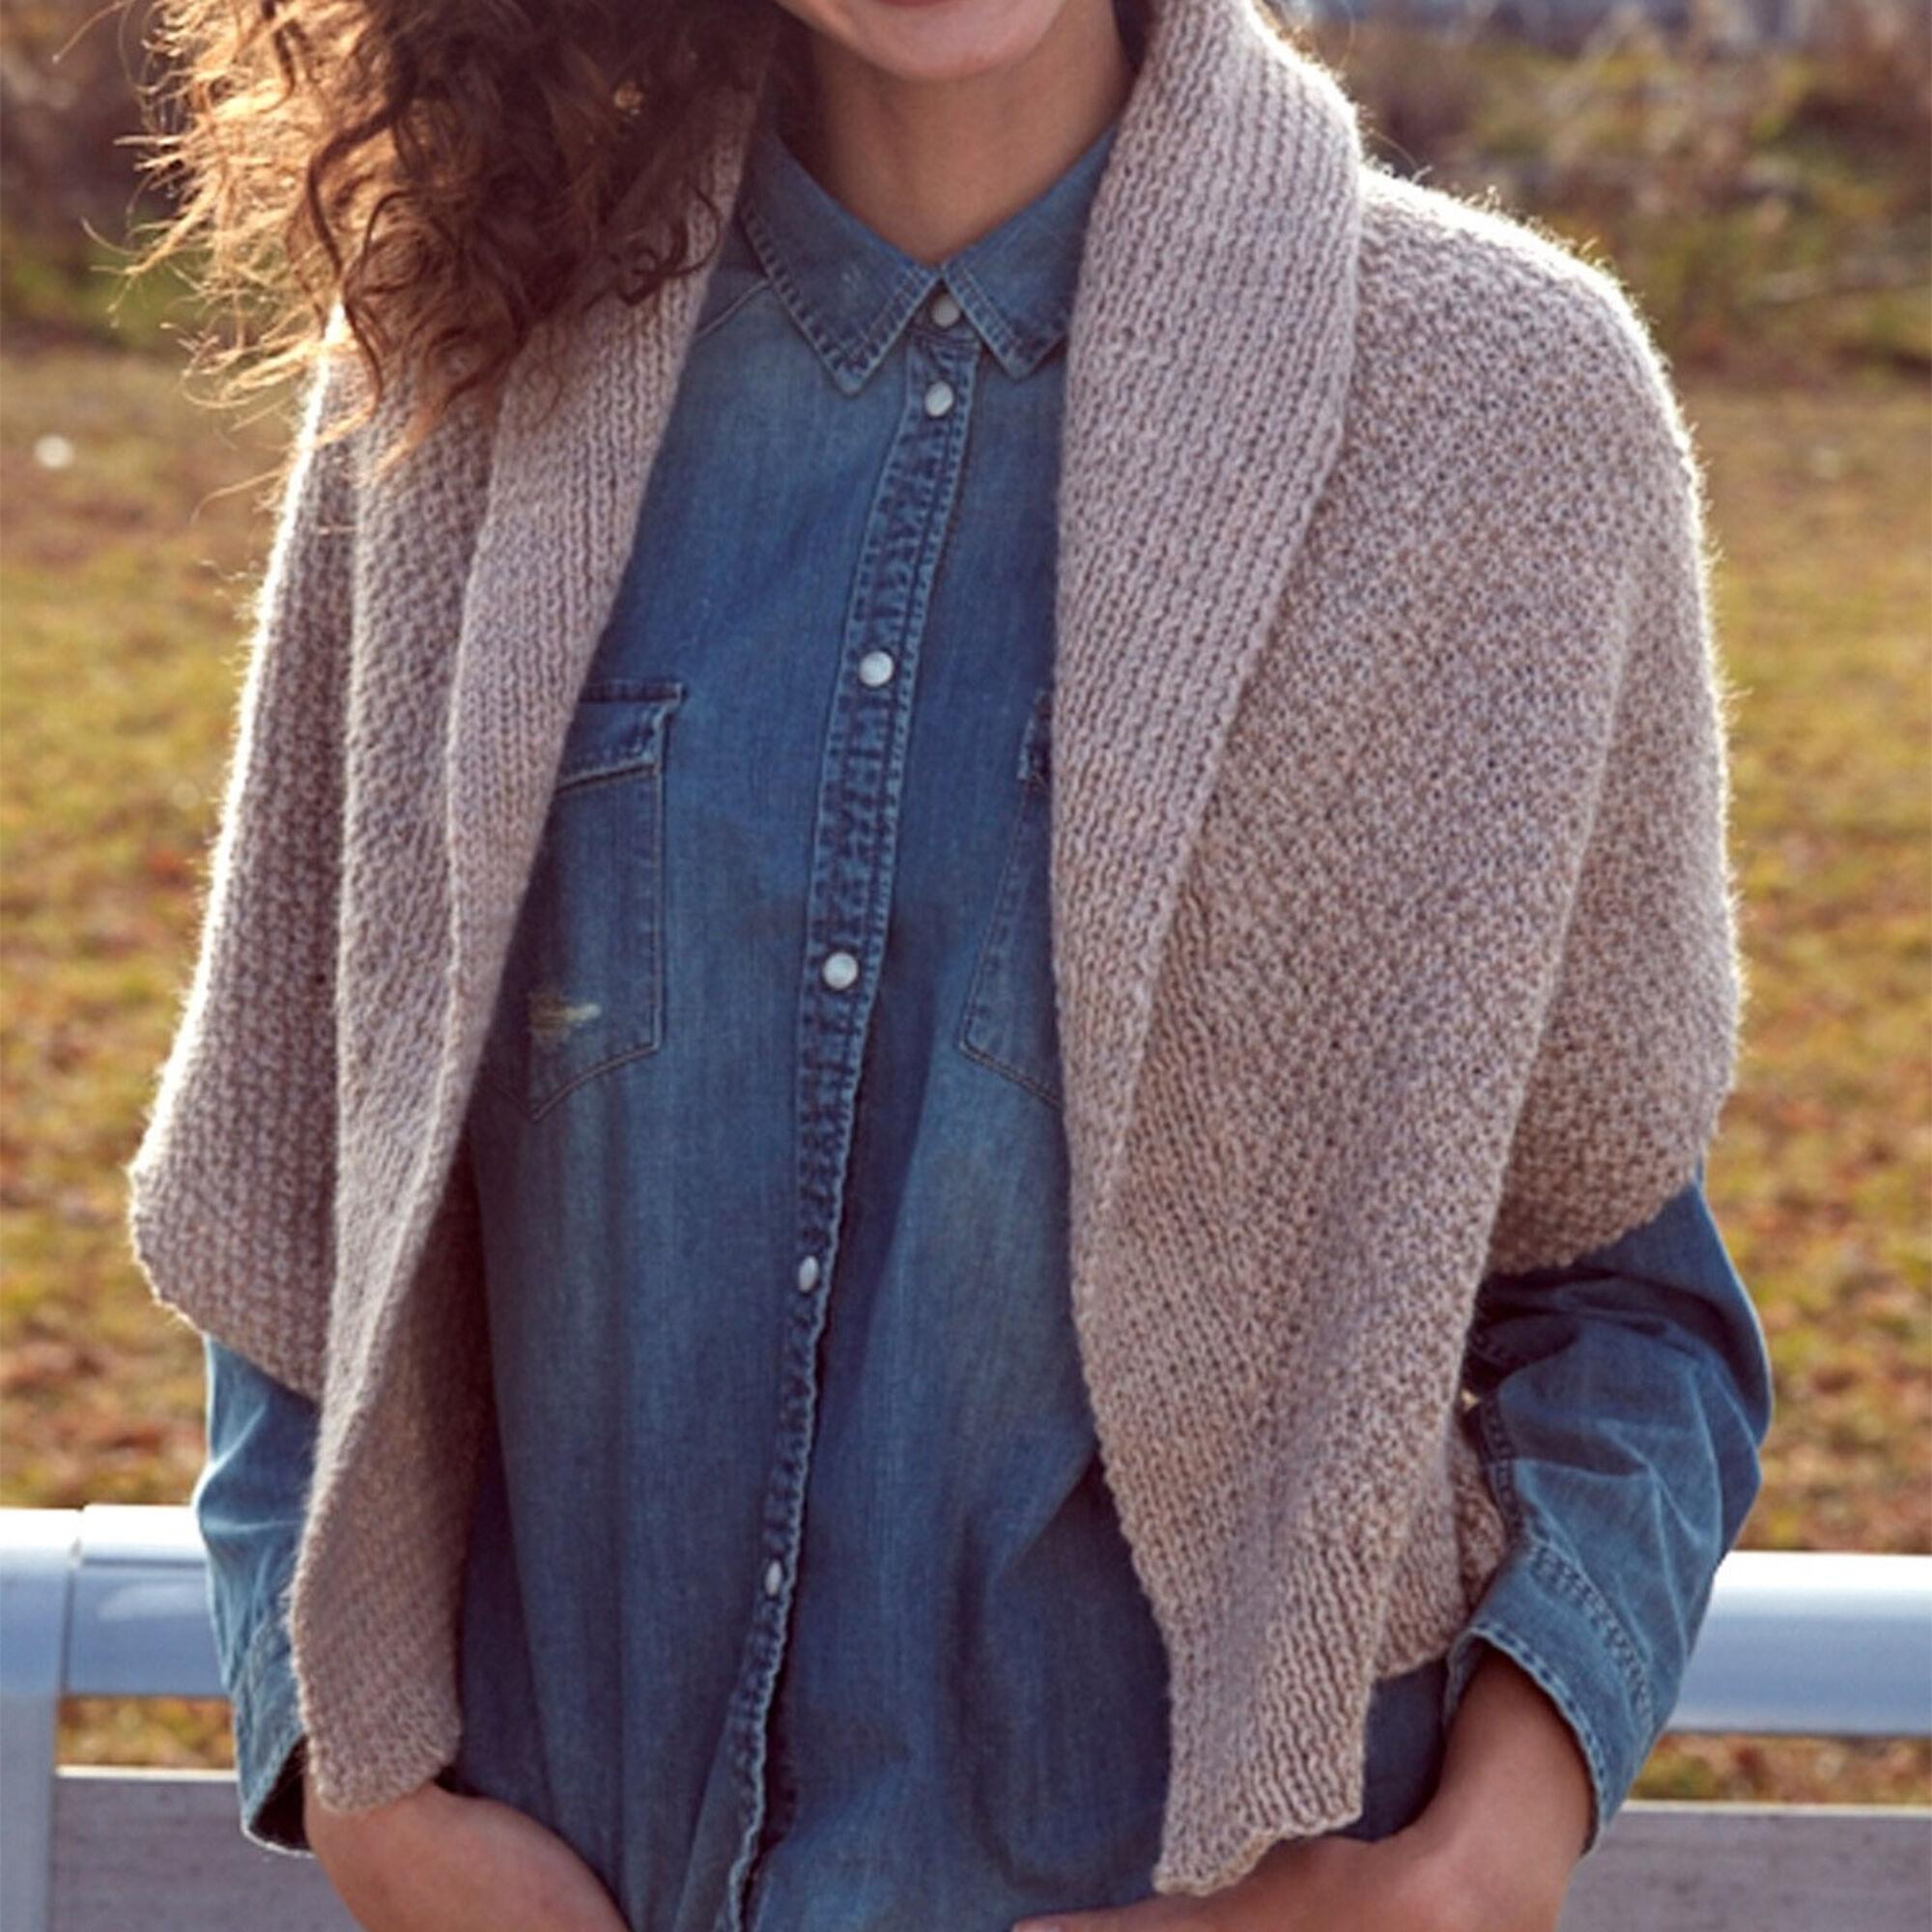 Patons Knit Envelope Cardigan, XS/S/M   Yarnspirations